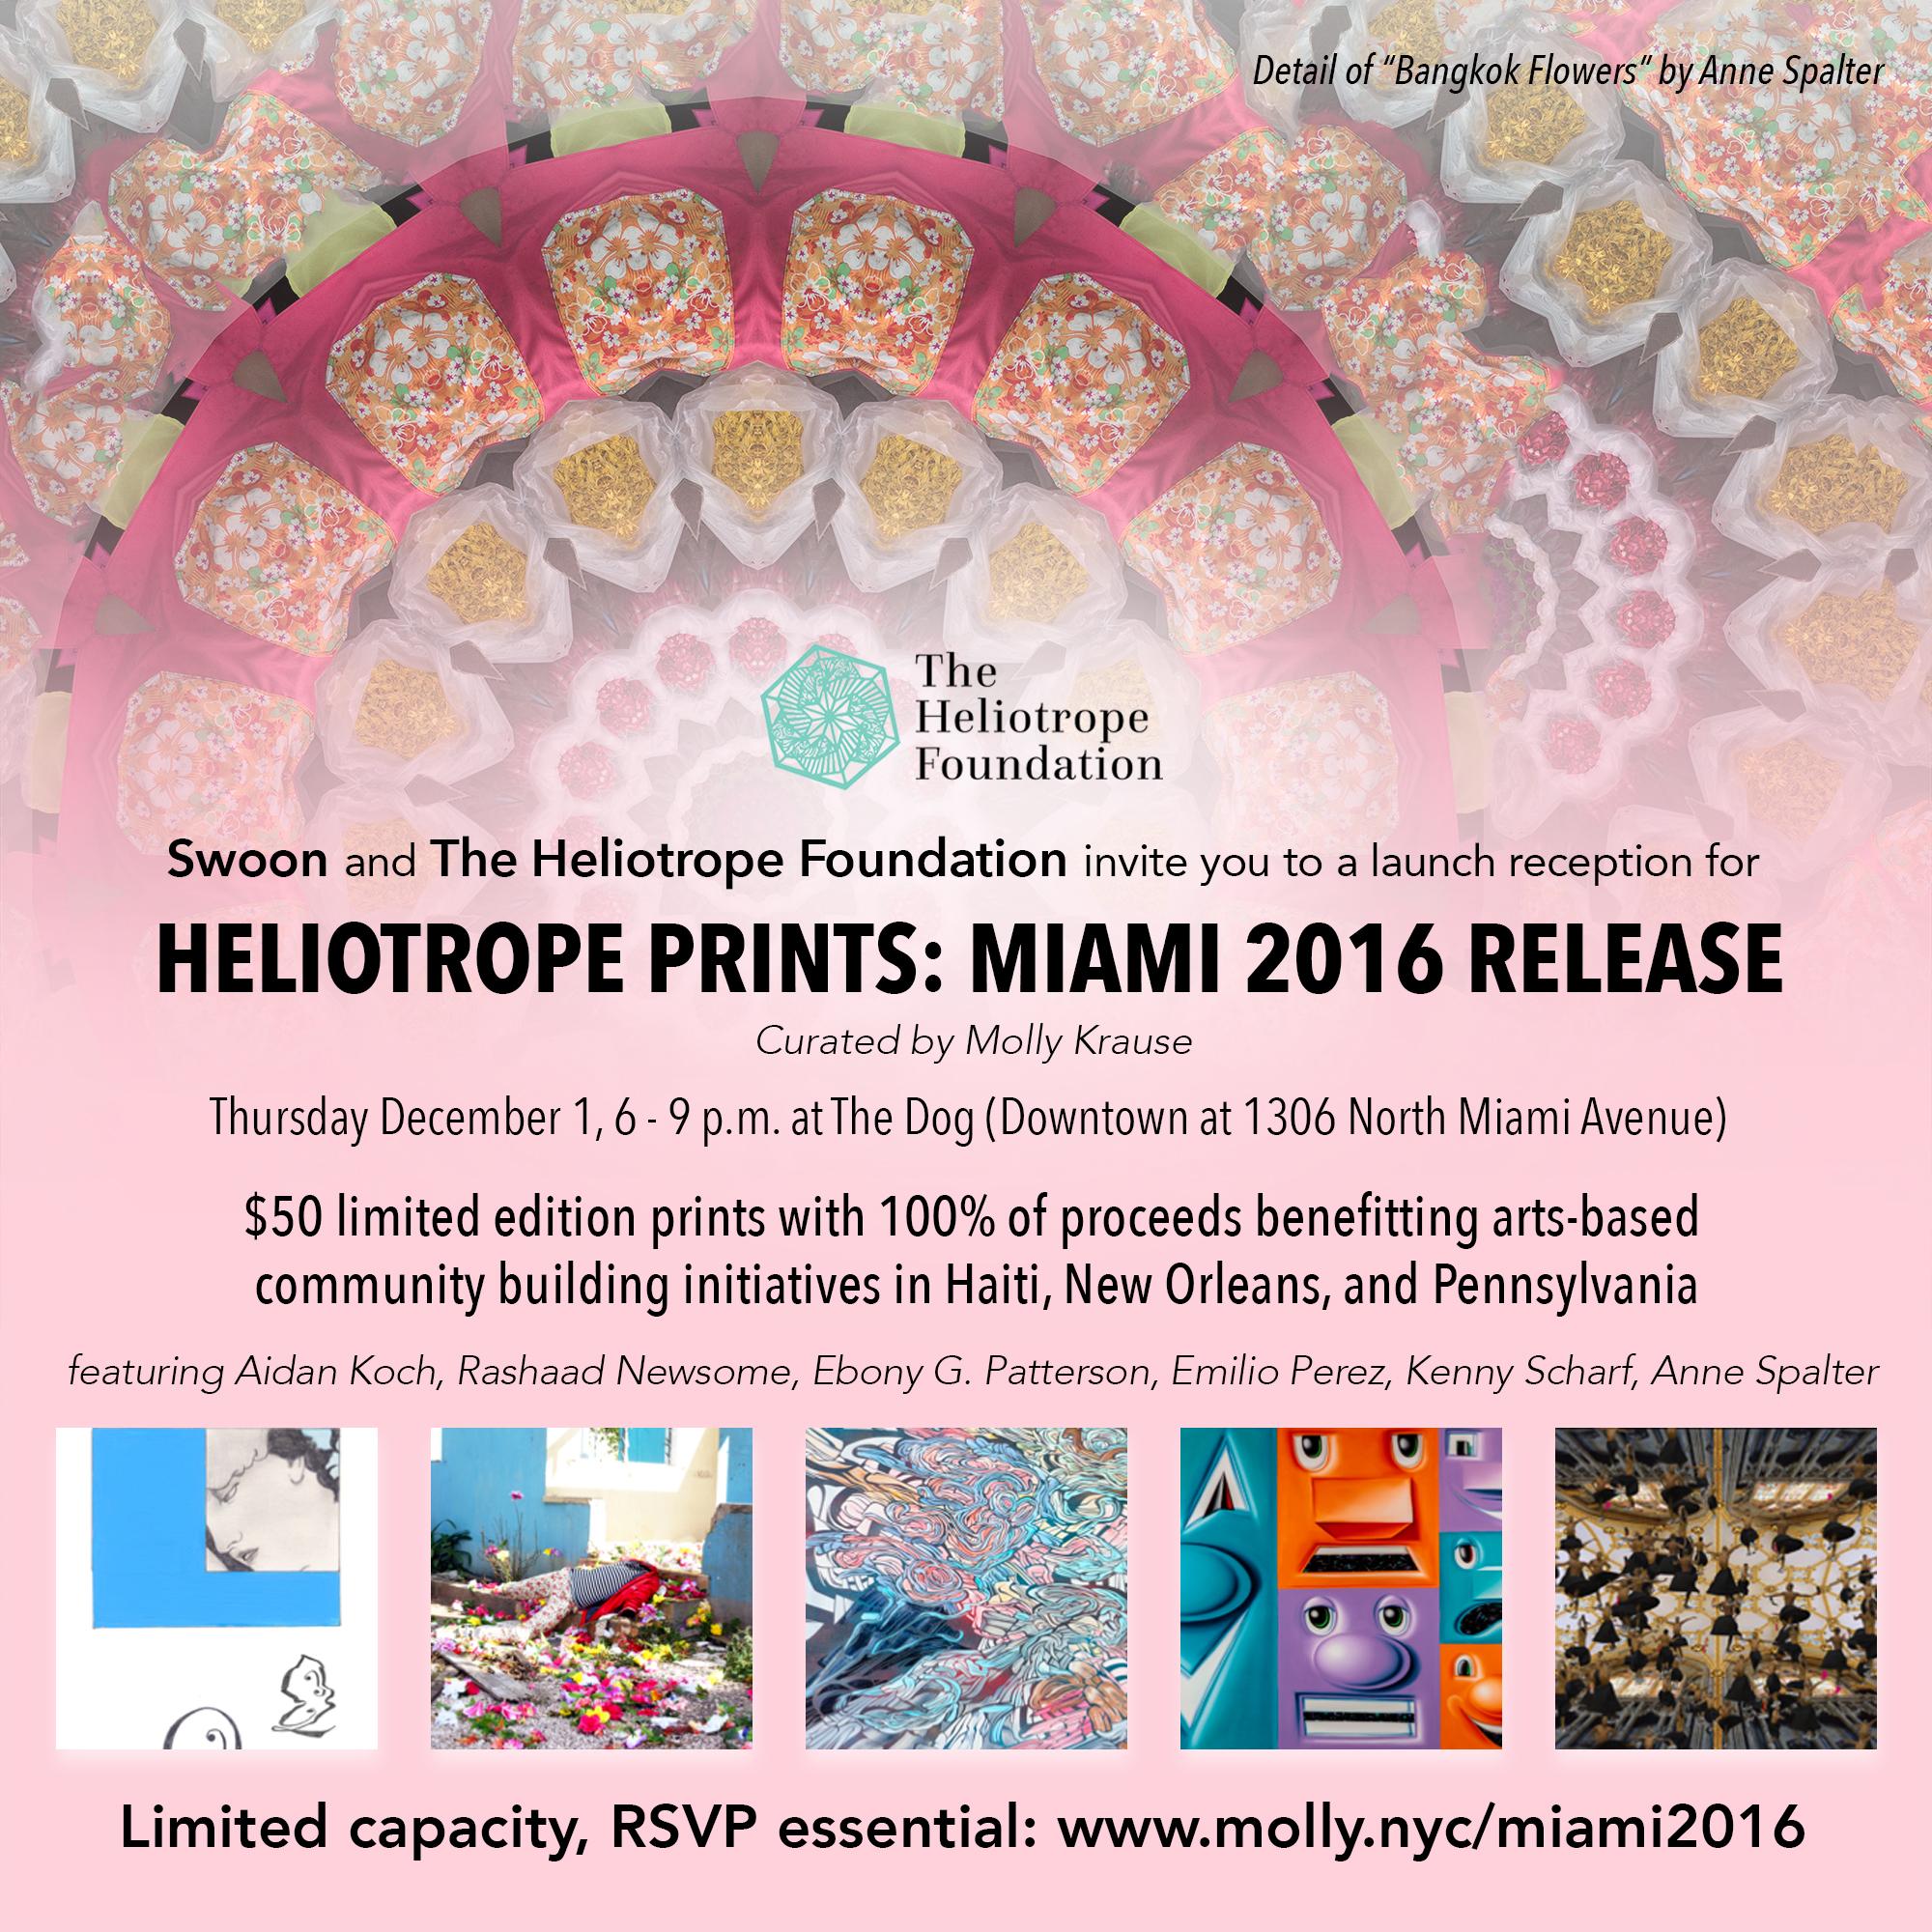 Heliotrope print reception miami 2016_Anne Spalter